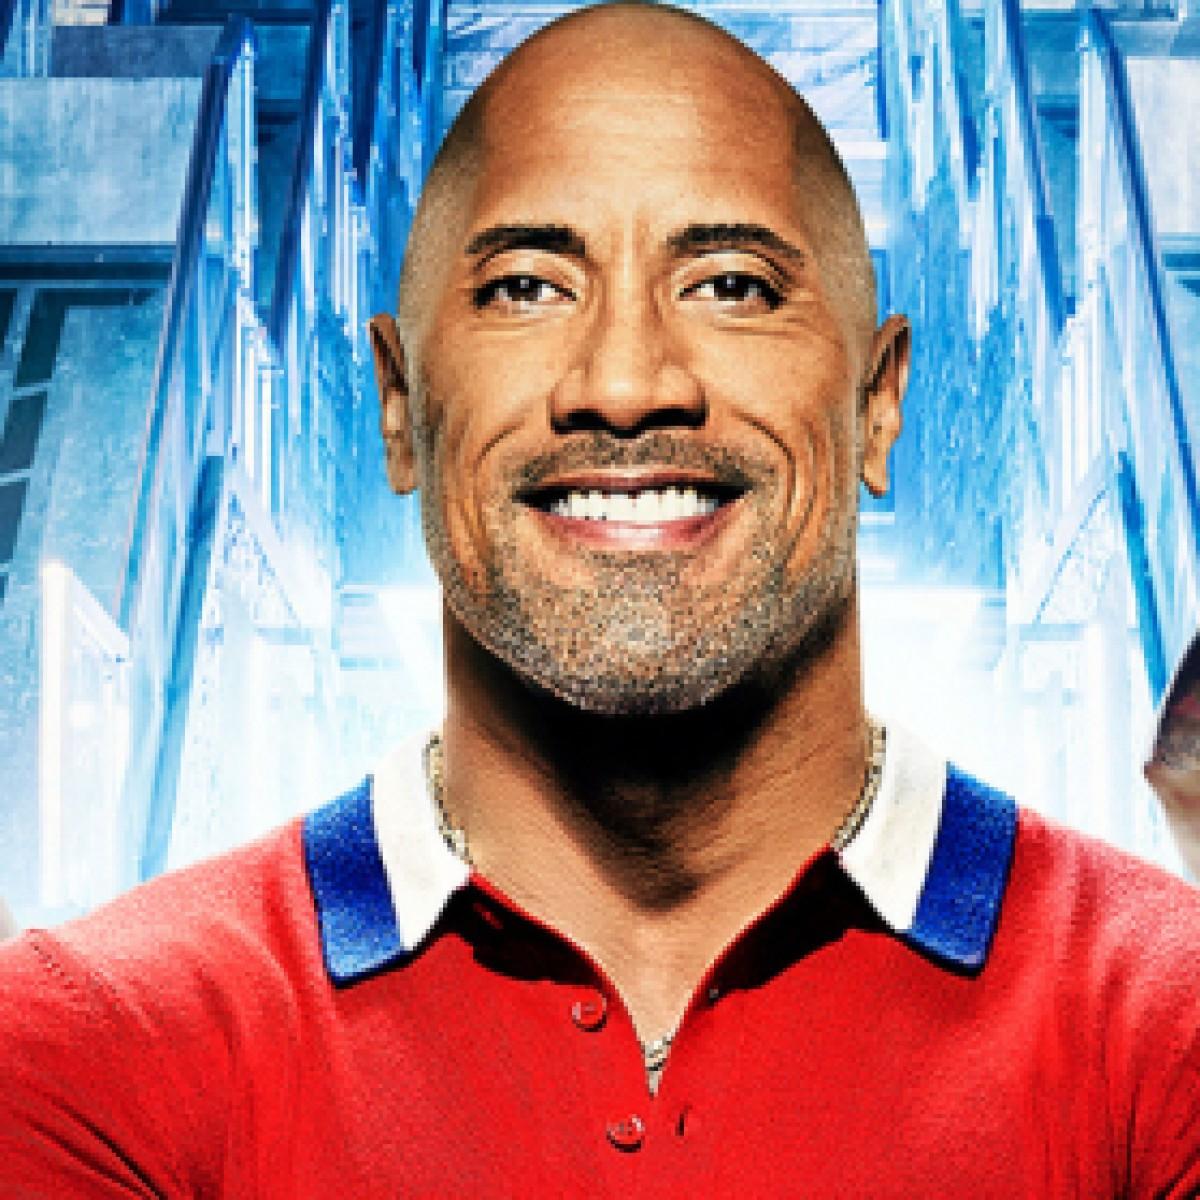 """Young Rock"": Dwayne Johnson produziert biografische Comedyserie – NBC bestellt erste Staffel über Anfangsjahre des Superstars – Bild: NBC"